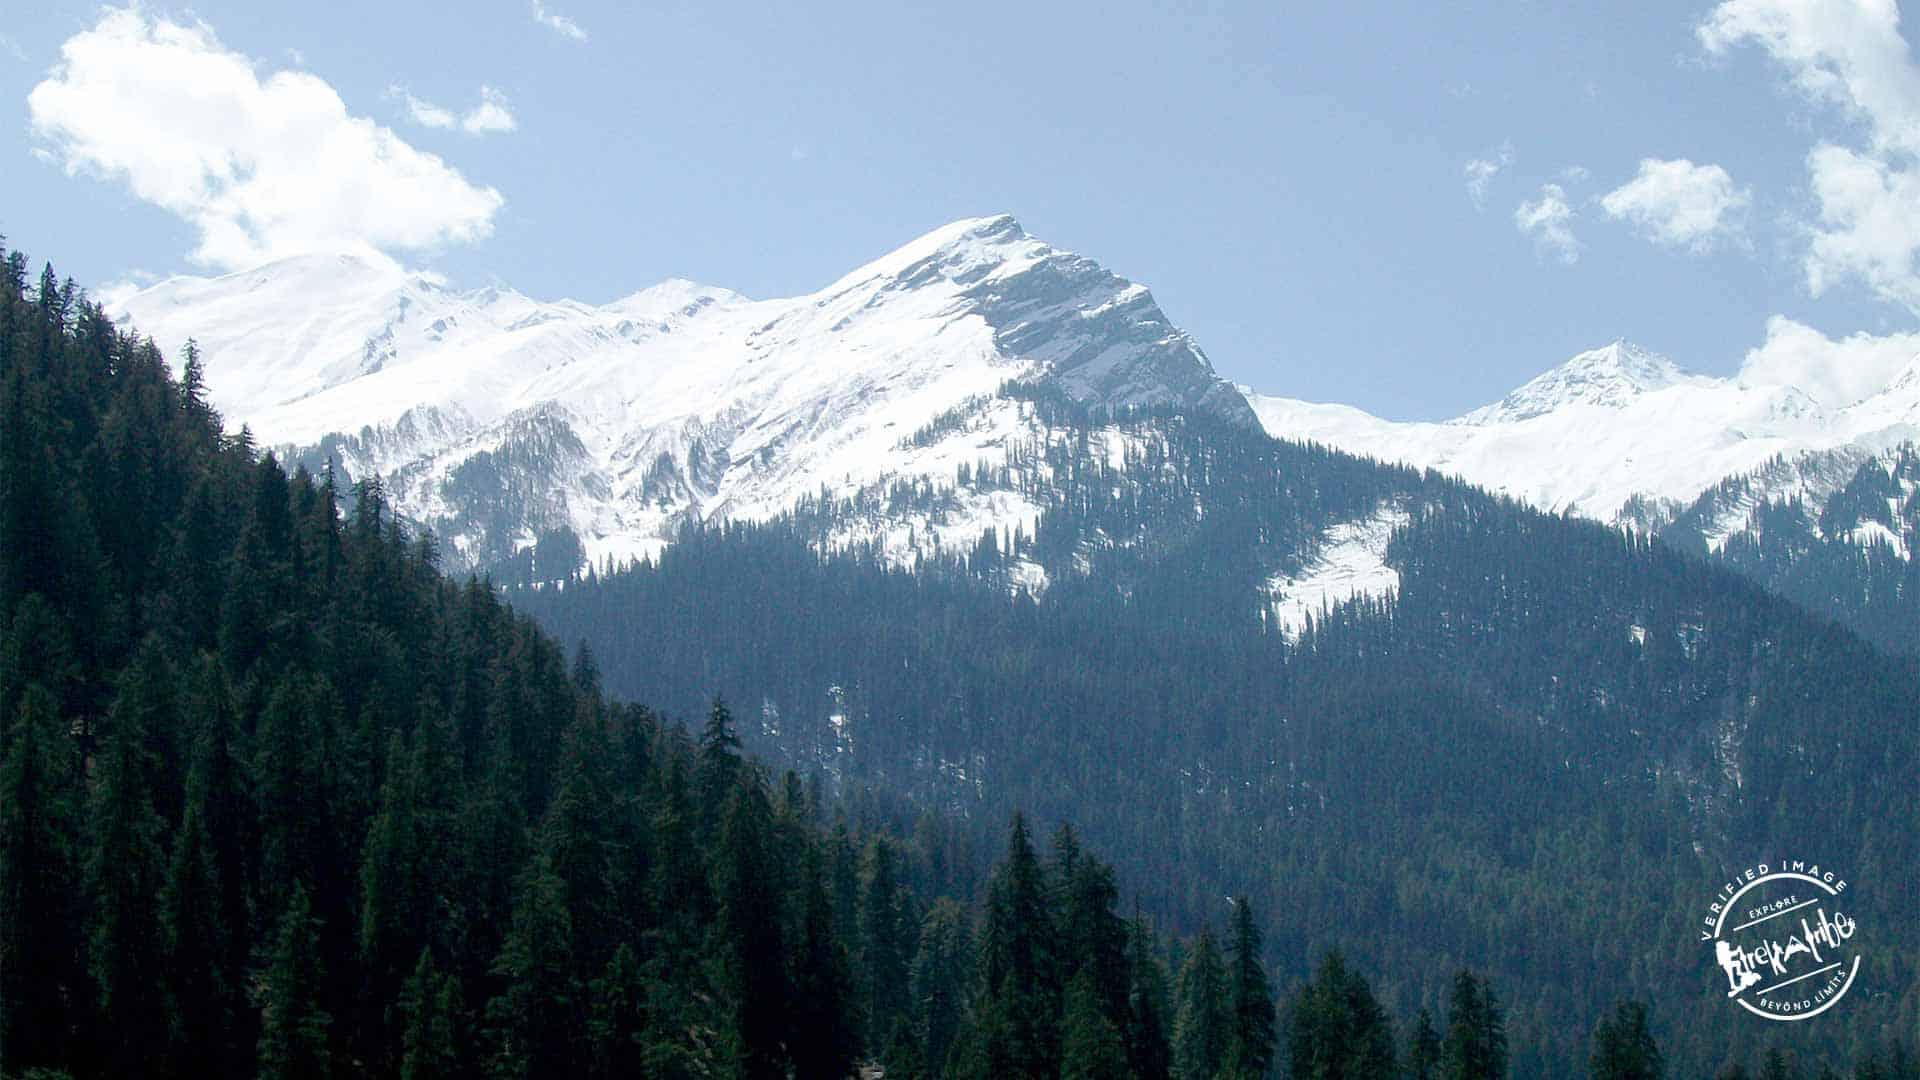 snow capped peak view from Kheerganga